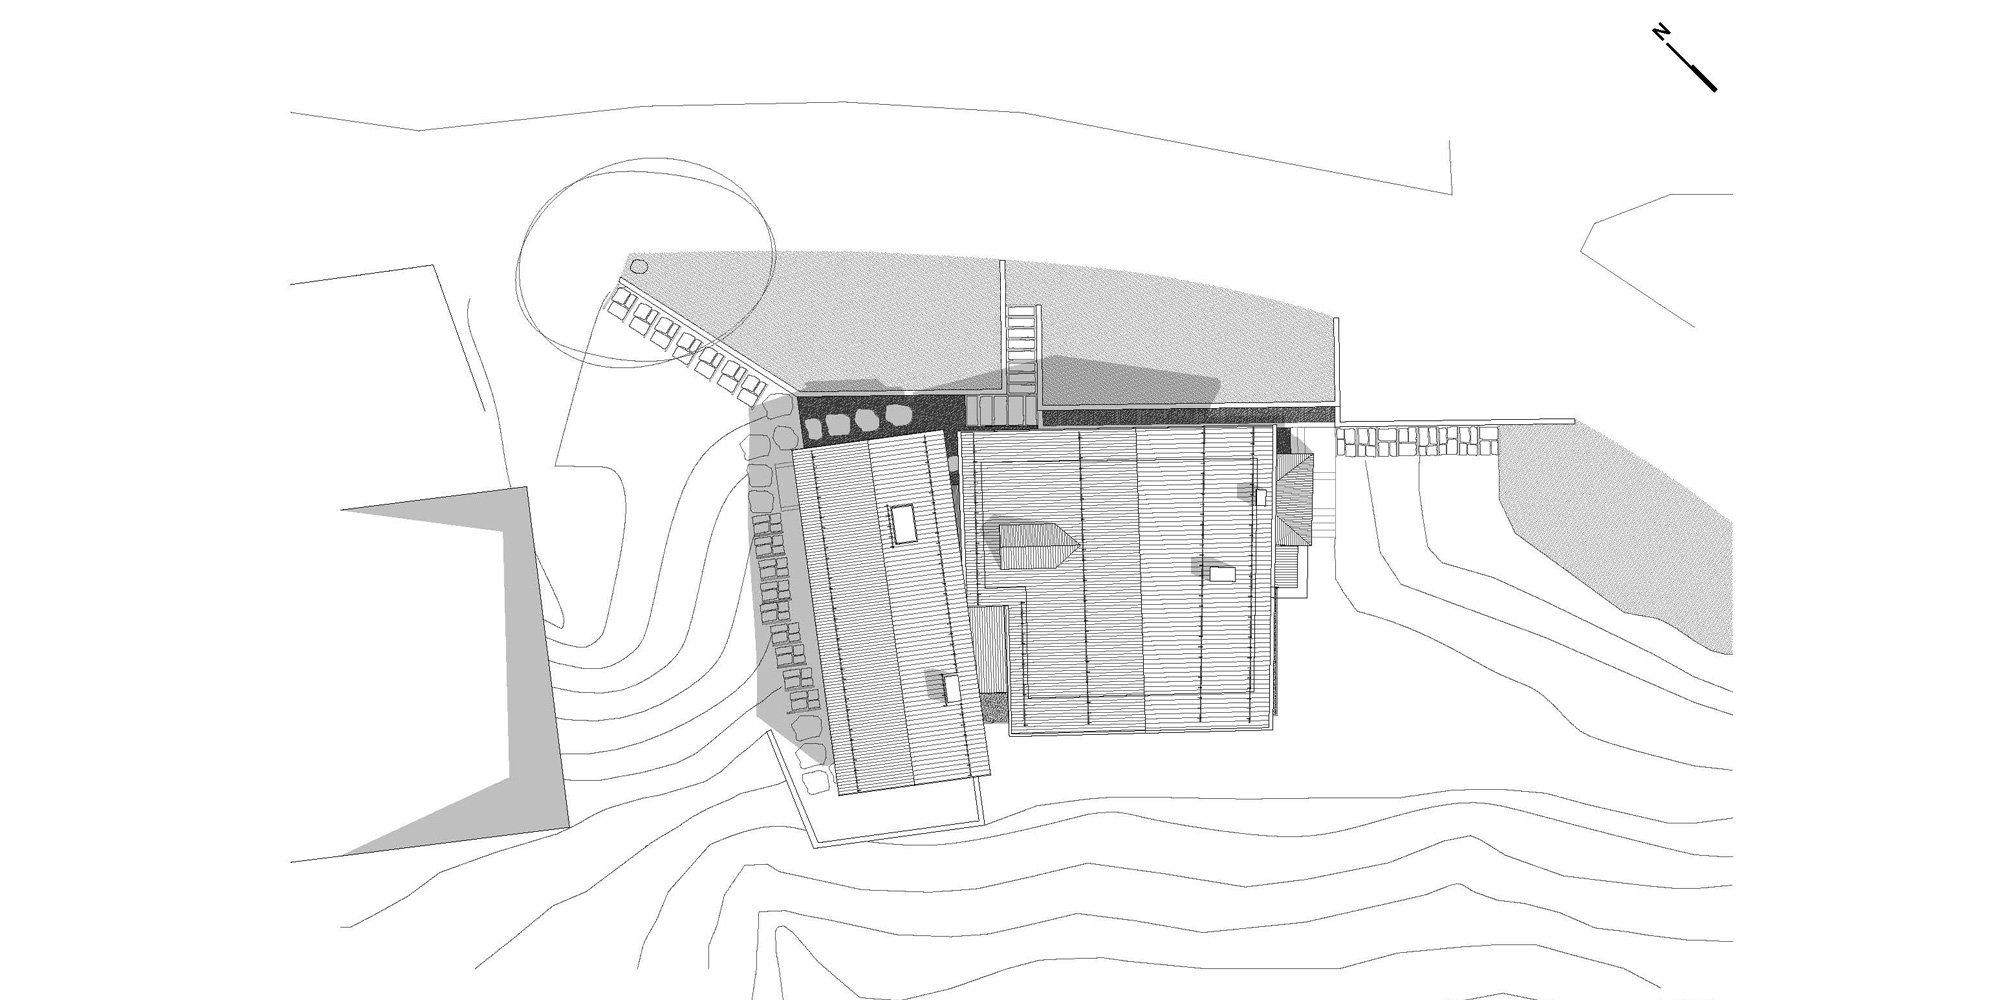 Roof plan © Clinicaurbana